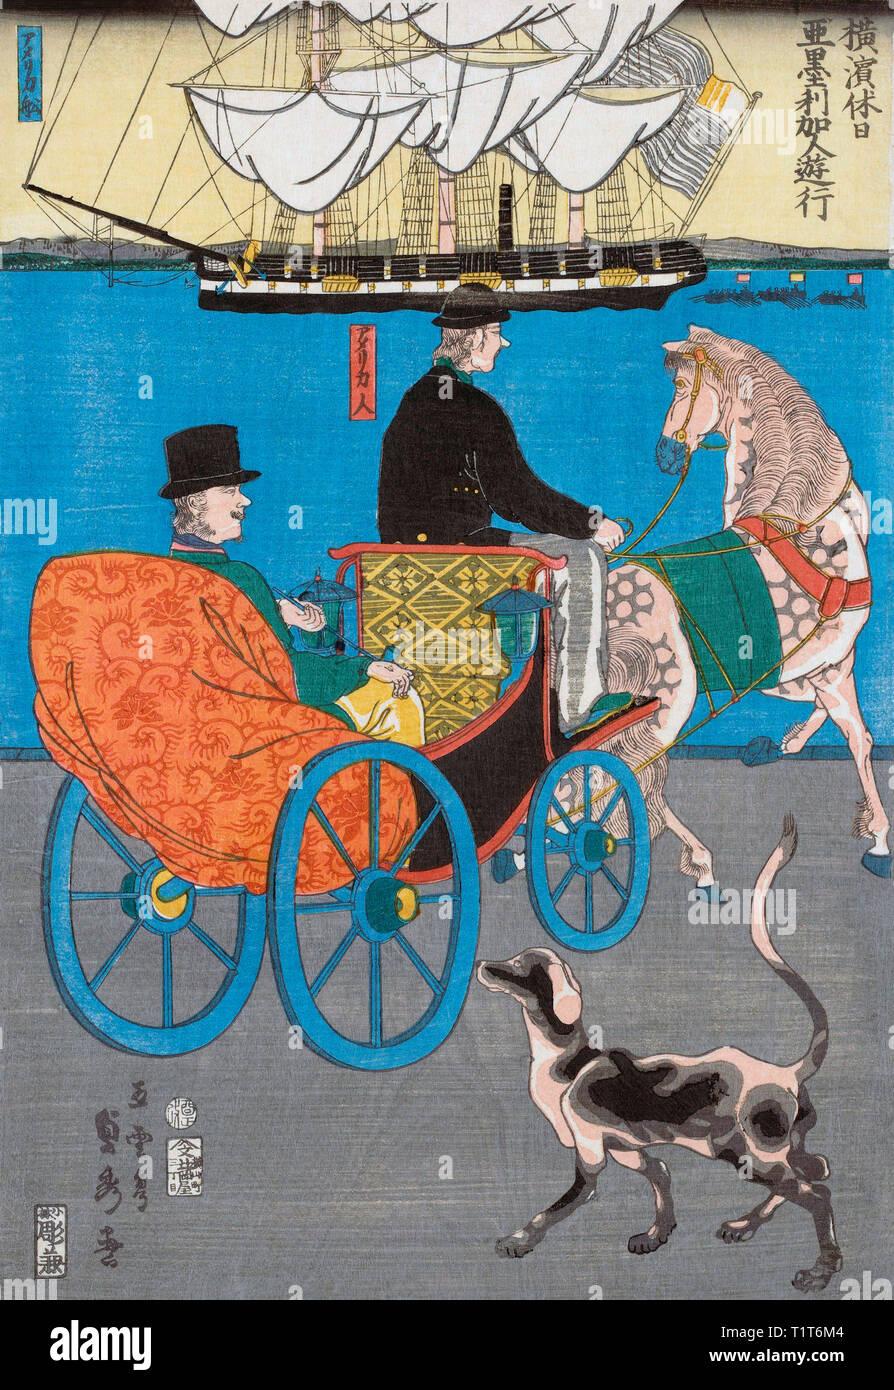 A tourist takes a horse and cart ride around the harbour of Yokohoma, Japan.  After a print by Japanese artist Utagawa Sadahide, 1807-1878/79, aka Gountei Sadahide. - Stock Image